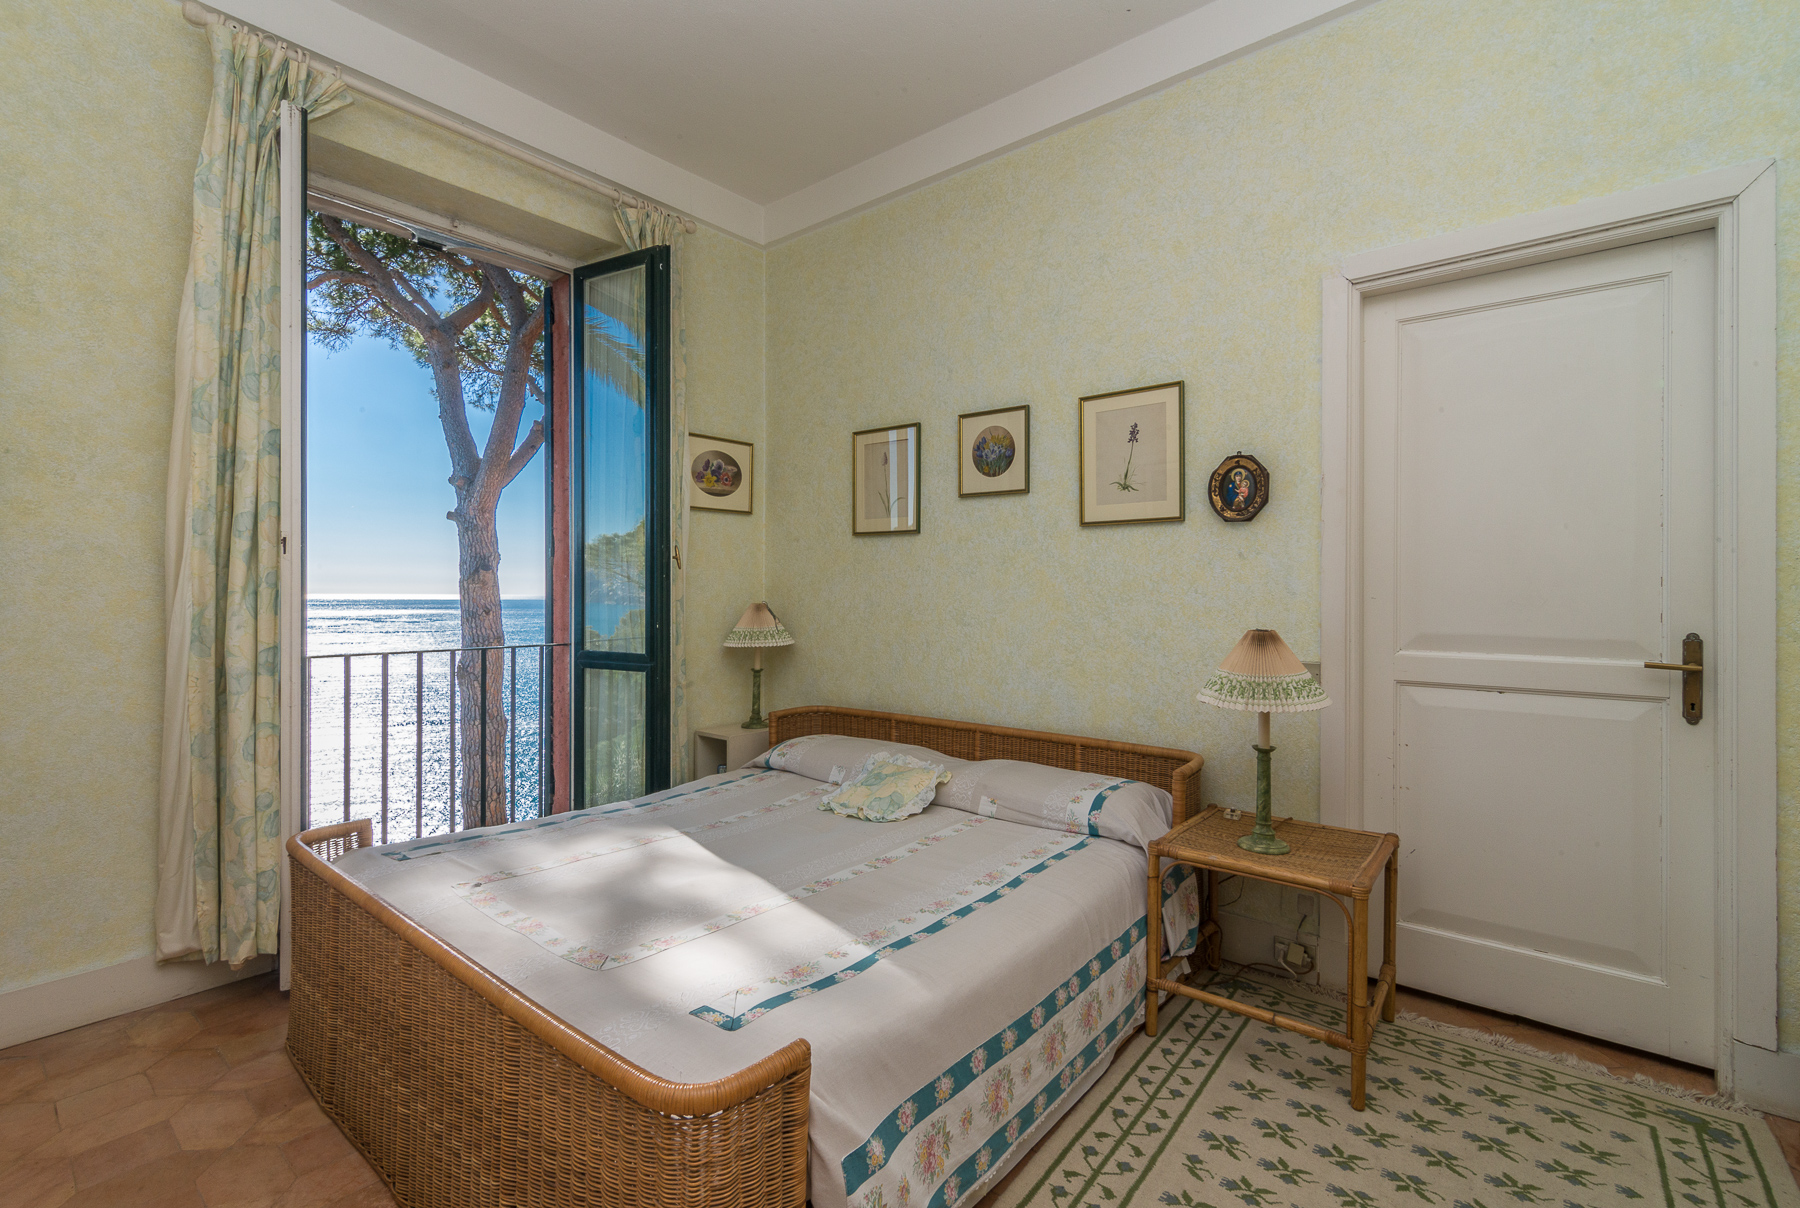 Villa in Vendita a Santa Margherita Ligure: 5 locali, 440 mq - Foto 30